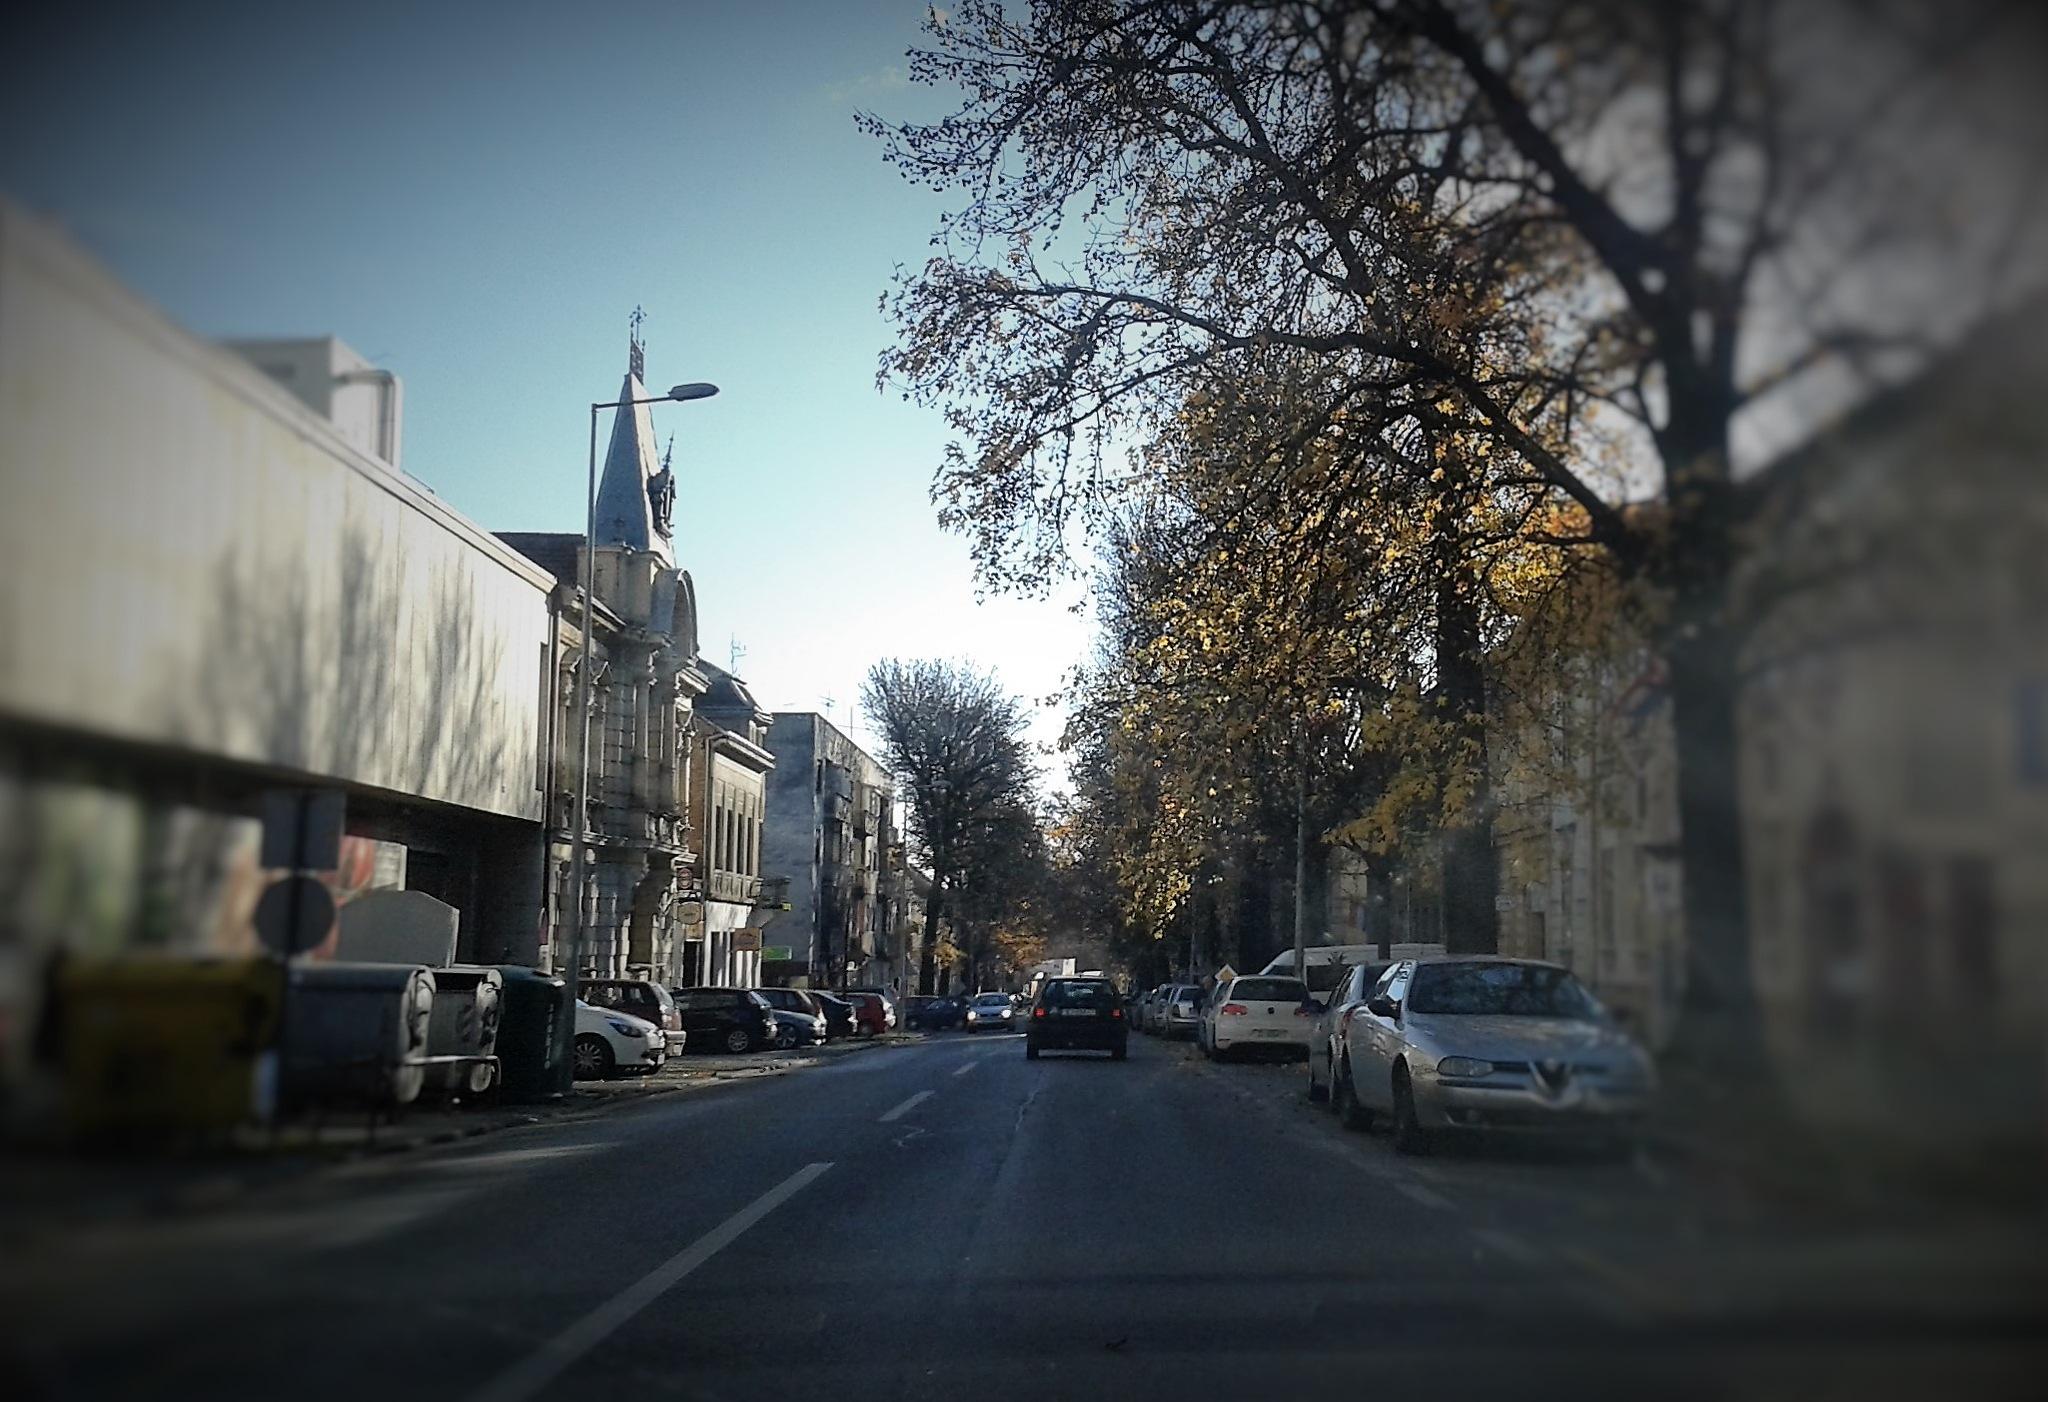 Panorama ulice u gradu Bjelovaru, Croatia by Mare